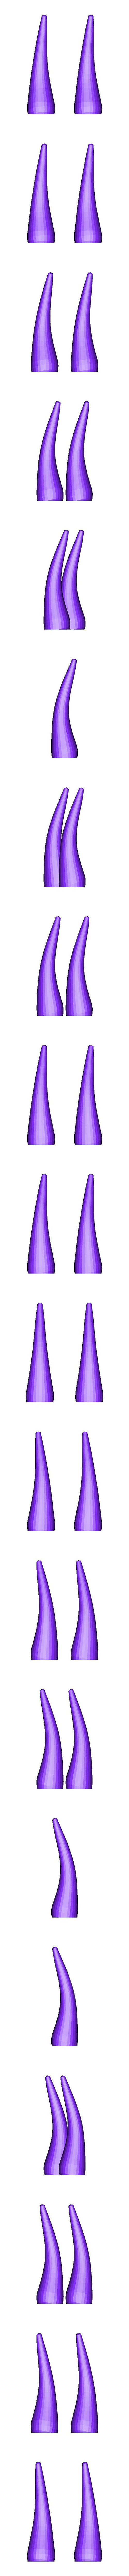 Teeth.stl Download 3MF file Lucius Malfoy Sale Wand • Model to 3D print, santuli700